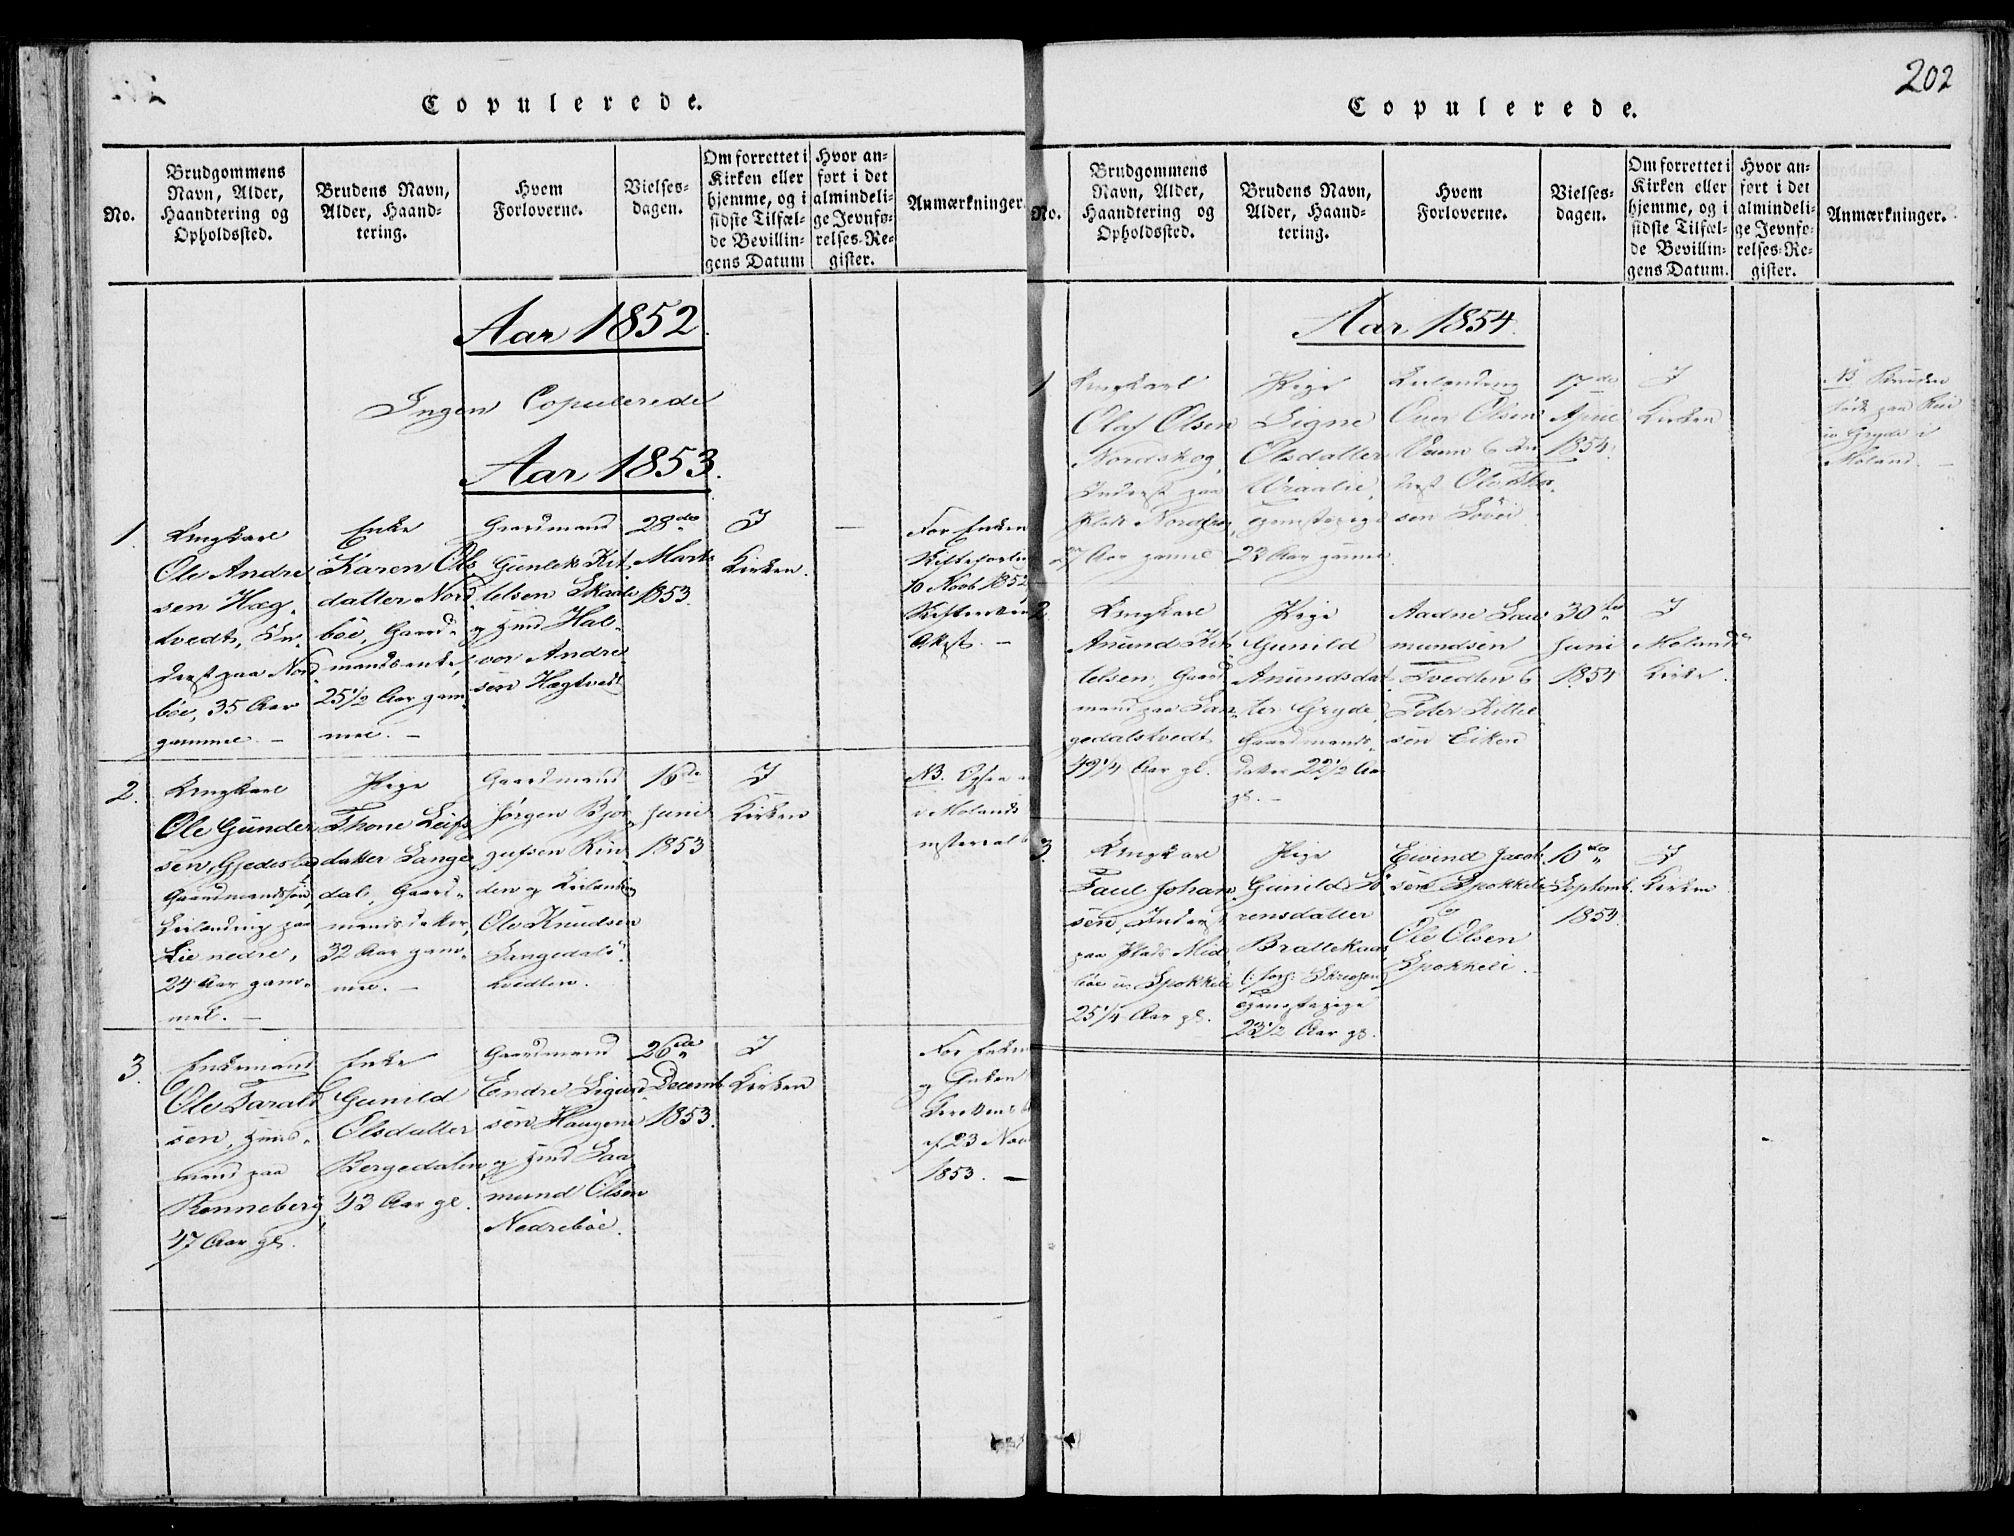 SAKO, Fyresdal kirkebøker, F/Fb/L0001: Ministerialbok nr. II 1, 1815-1854, s. 202